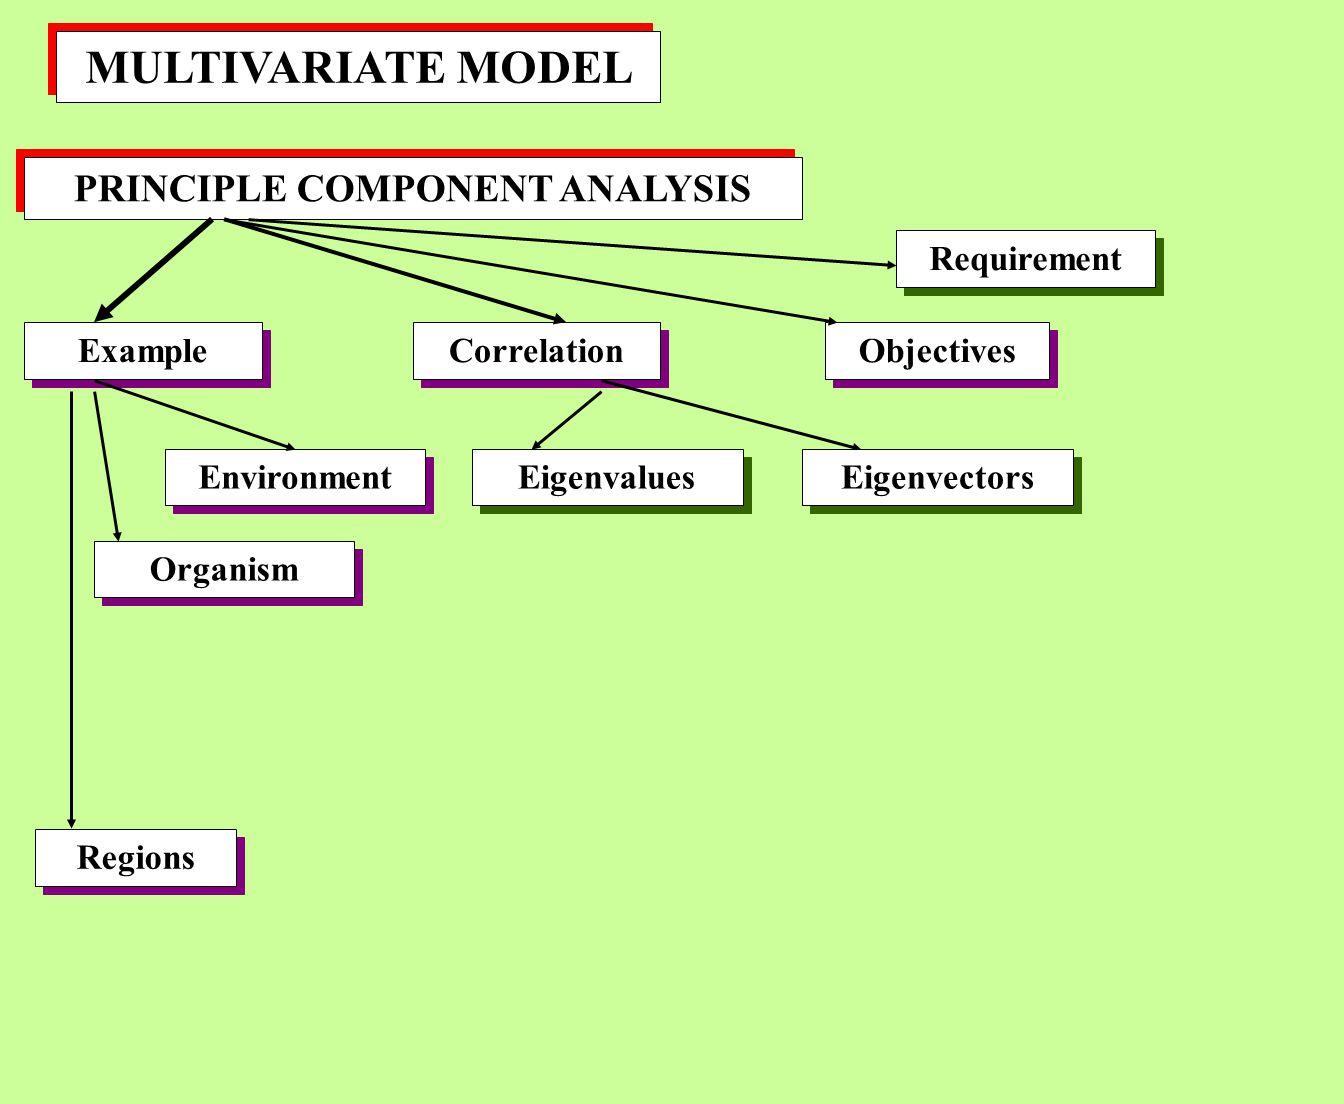 MULTIVARIATE MODEL PRINCIPLE COMPONENT ANALYSIS Example Correlation Organism Environment Eigenvalues Regions Objectives Requirement Eigenvectors